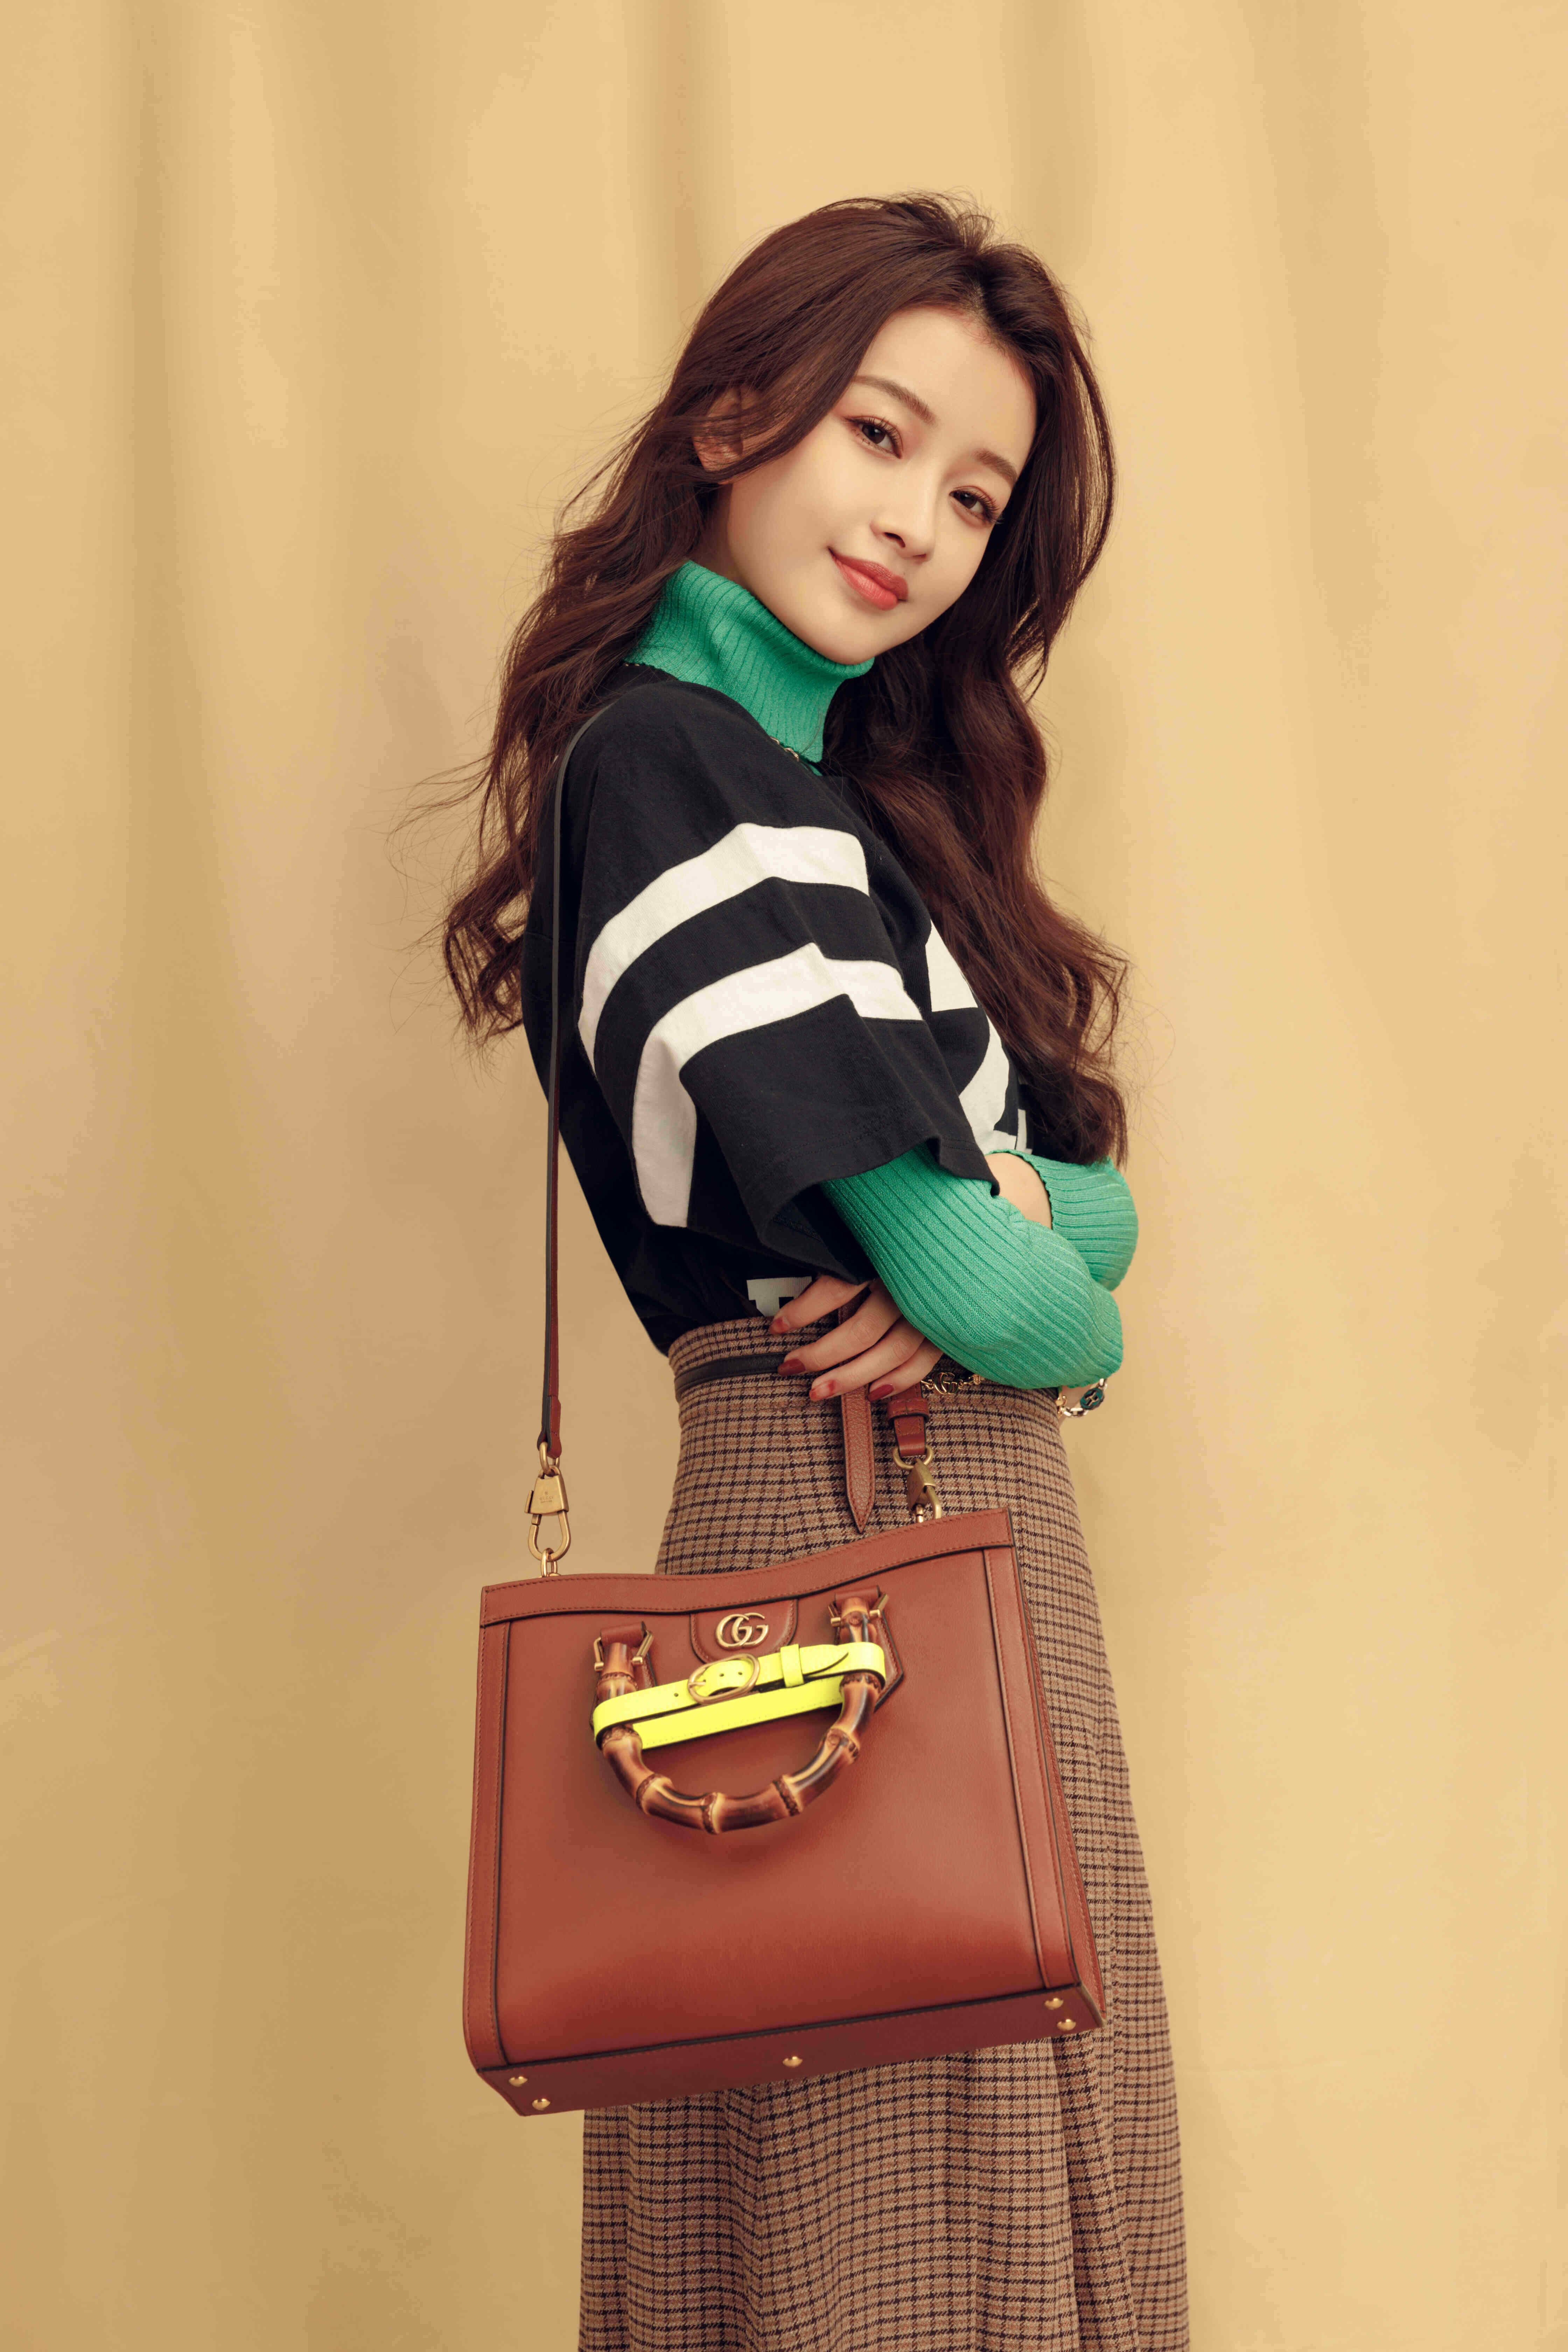 Sun Yi carrying the Gucci 'Diana' small tote bag